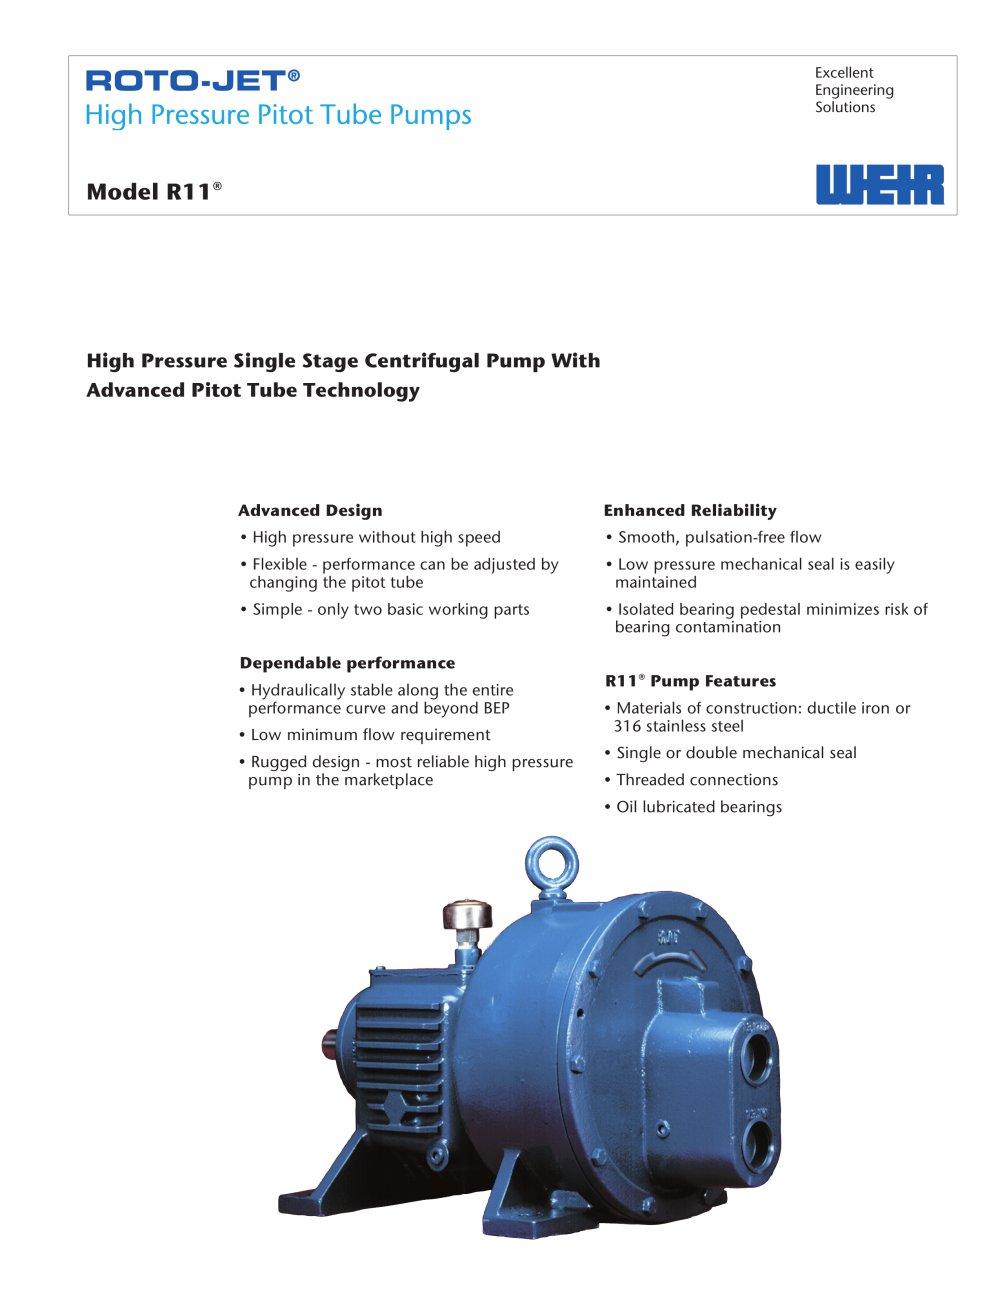 roto jet model r11 weir power industrial pdf catalogue rh pdf directindustry com Roto-Jet High Pressure Pump Roto Jet Pump Curves